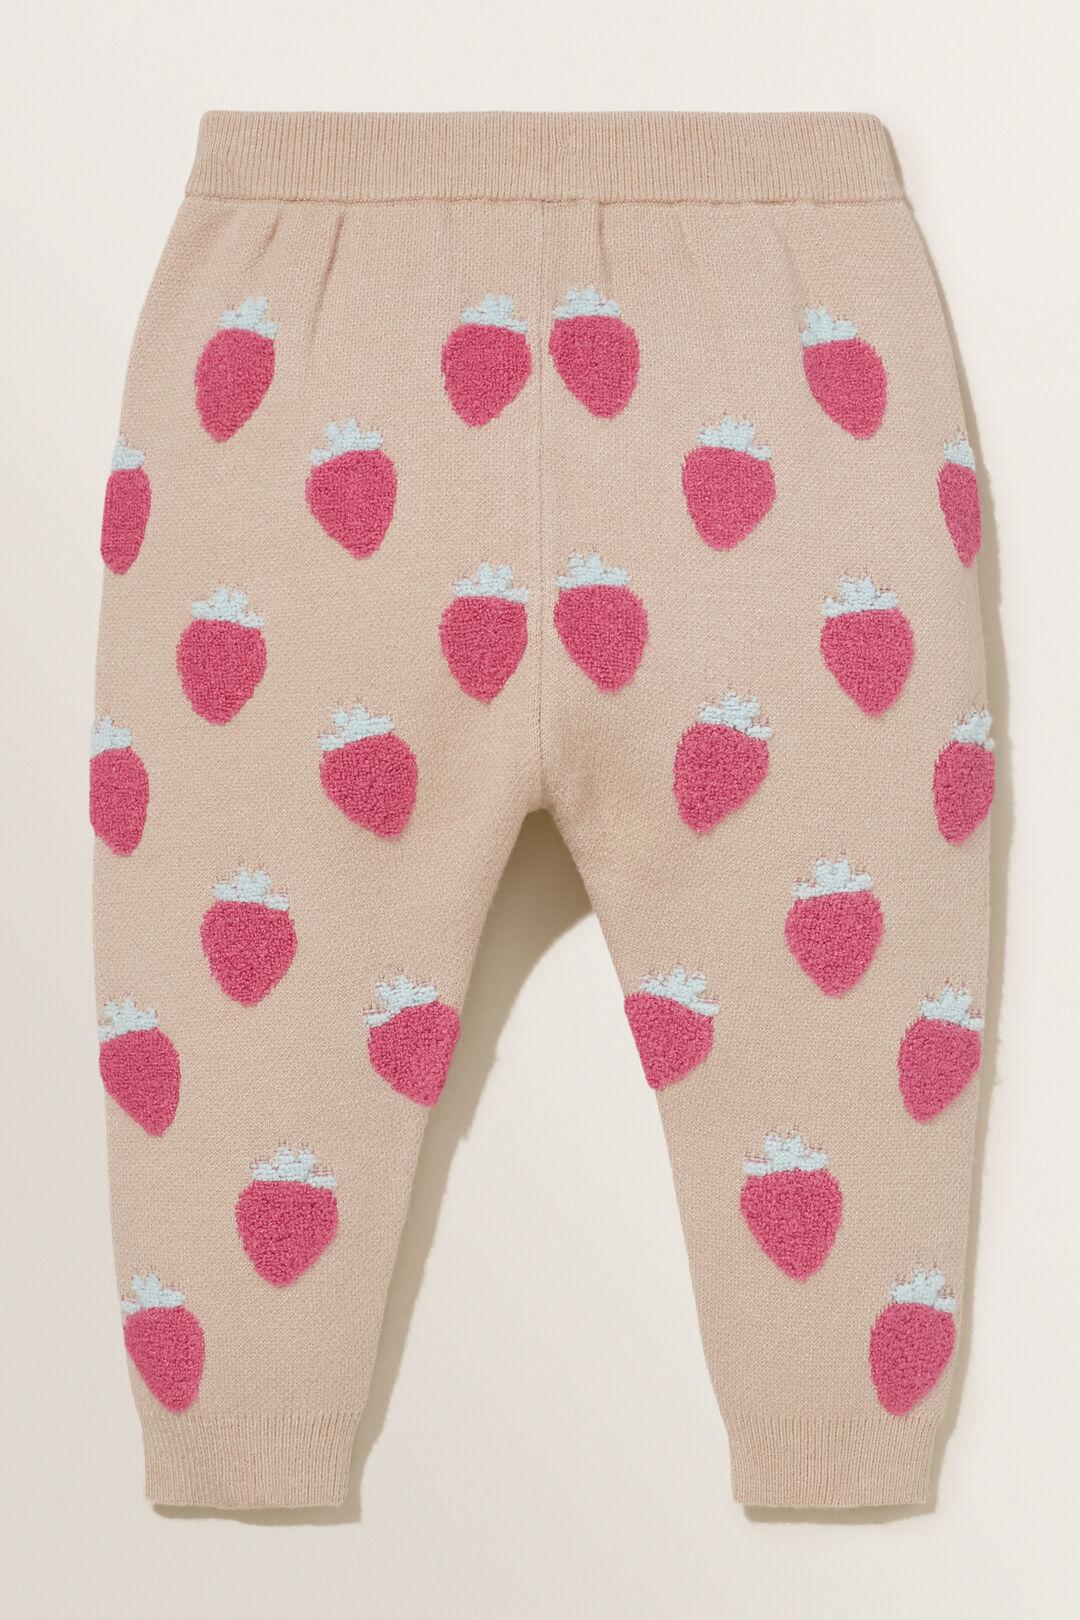 Strawberry Knit Pants  CHAI  hi-res